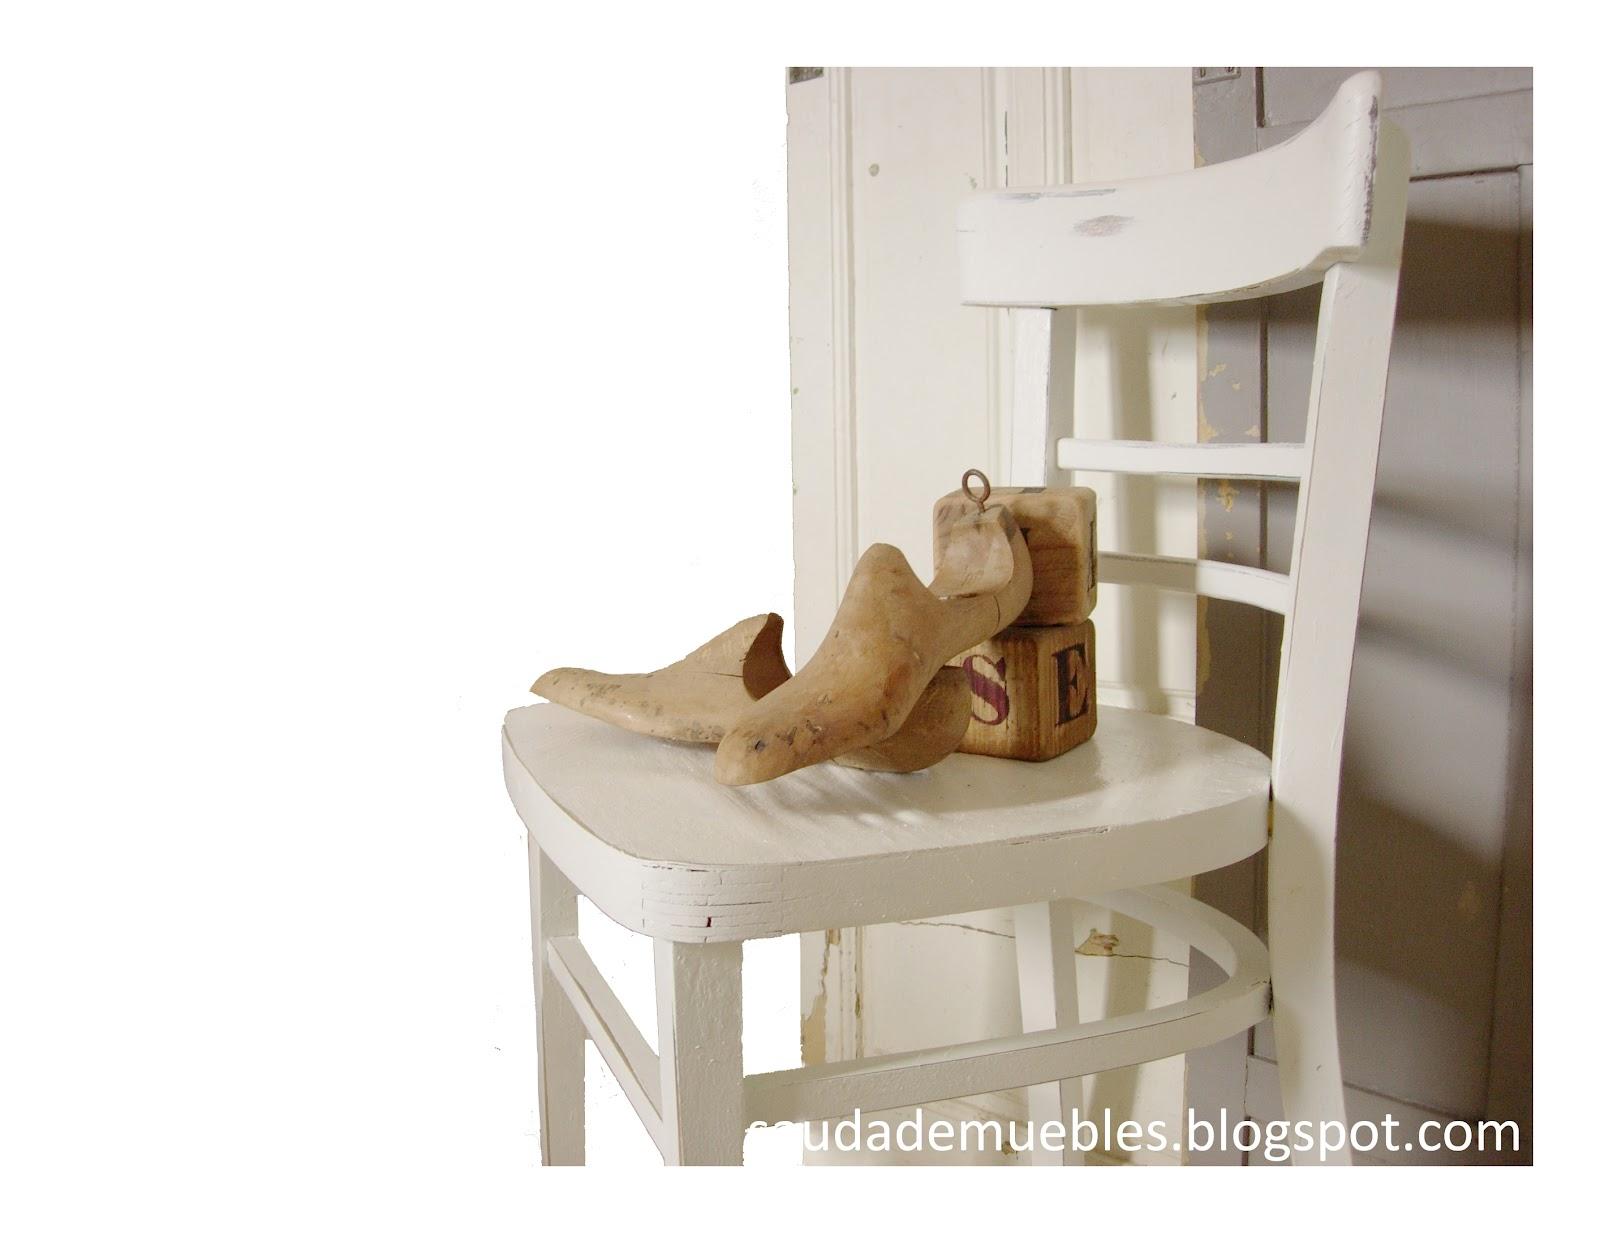 Saudade con las sillas de un bar for Sillas bonitas